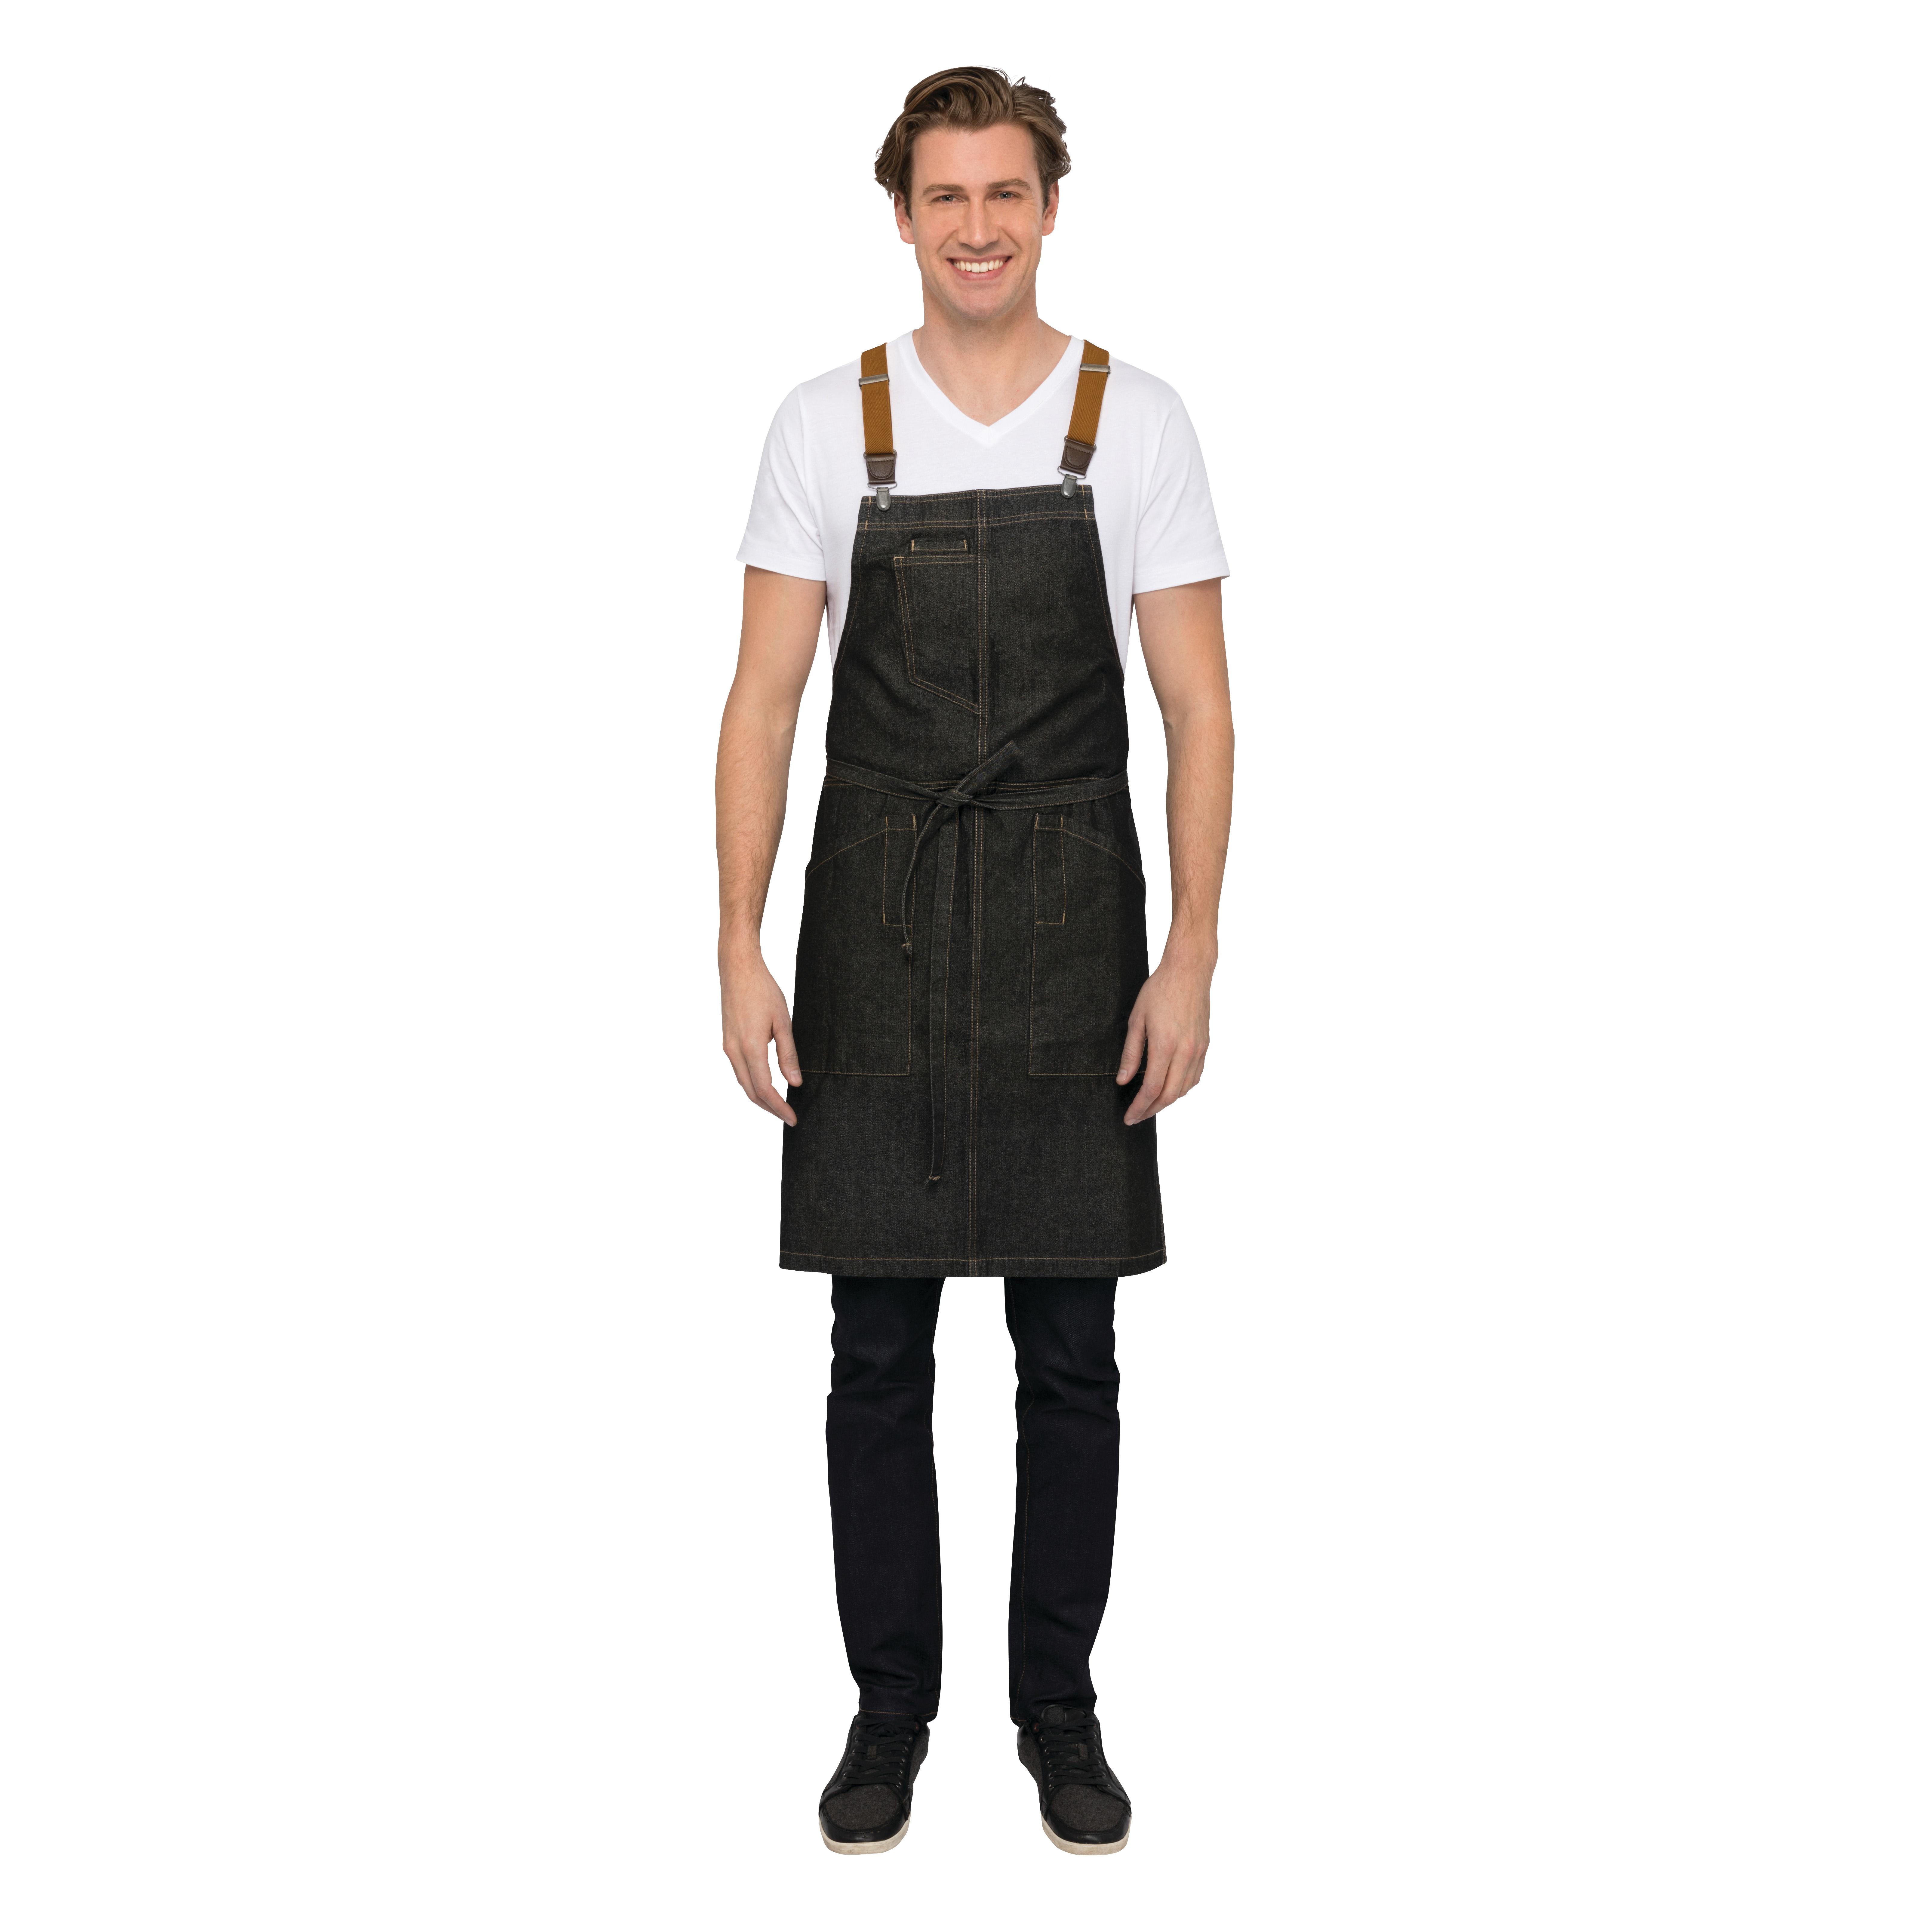 Chef Works ABS01BLK0 bib apron